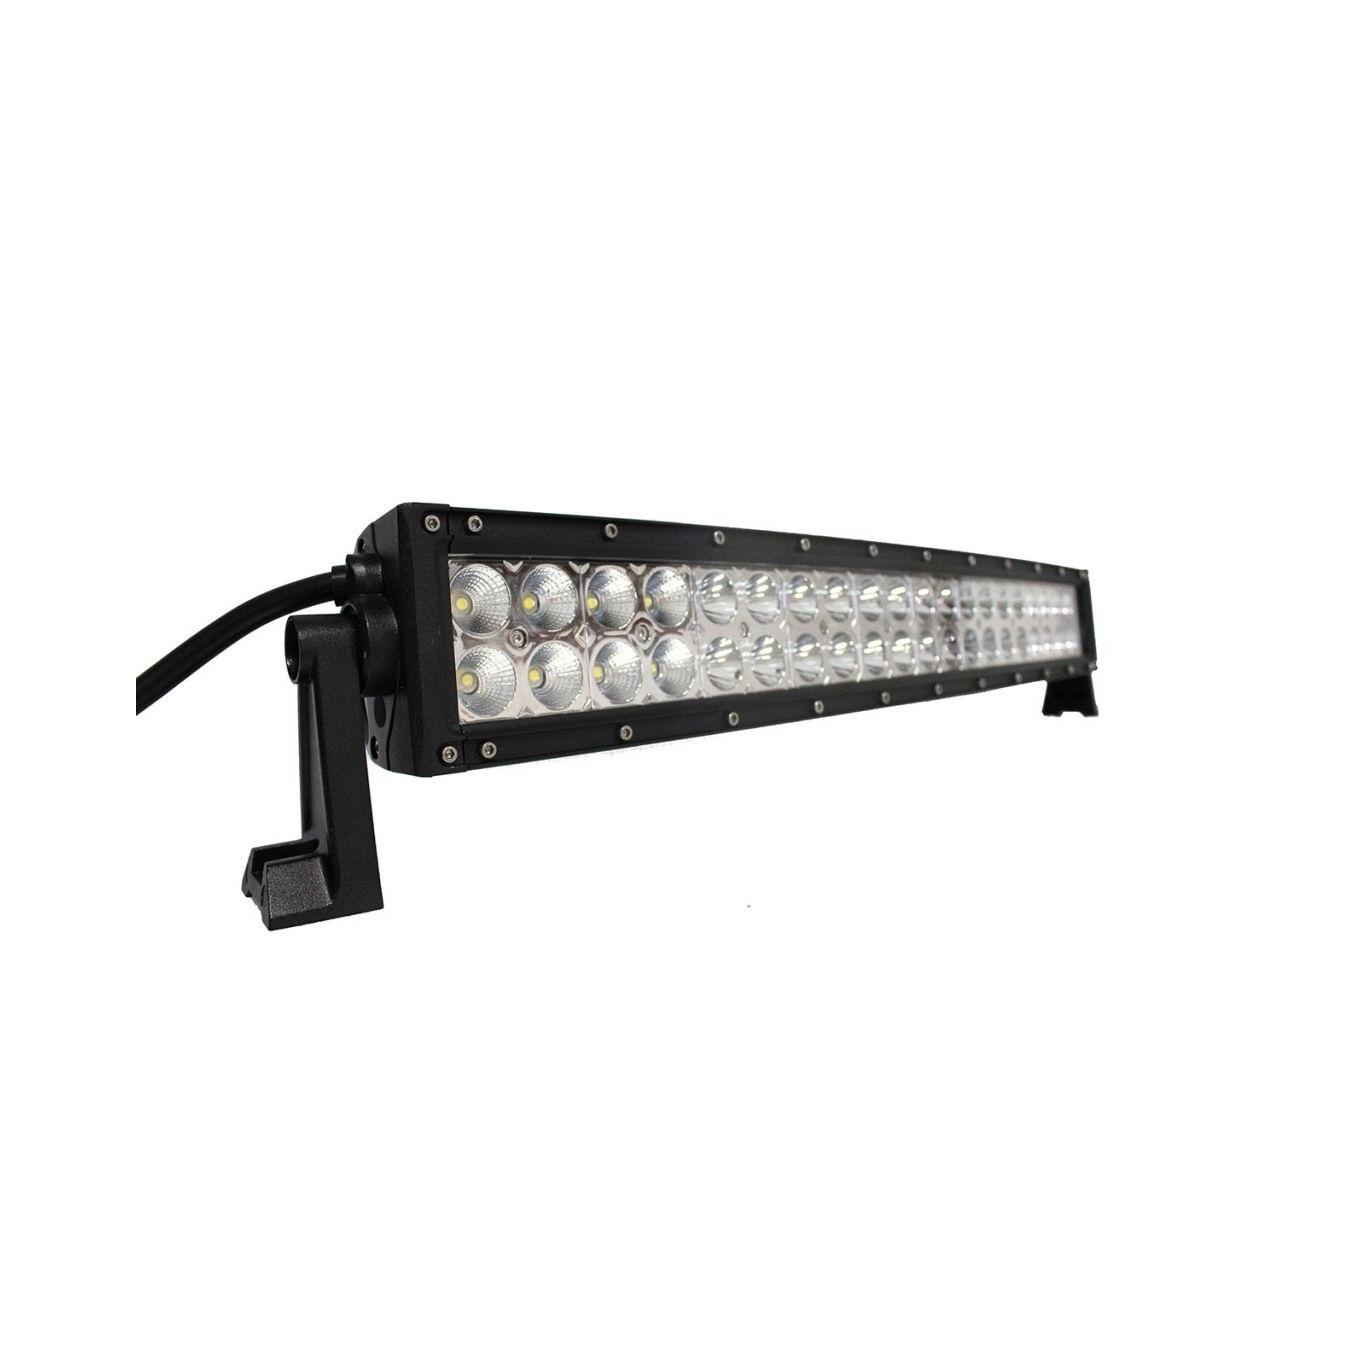 SHARK LED LIGHT BAR, CURVED, 20 , 120W, R 560 MM